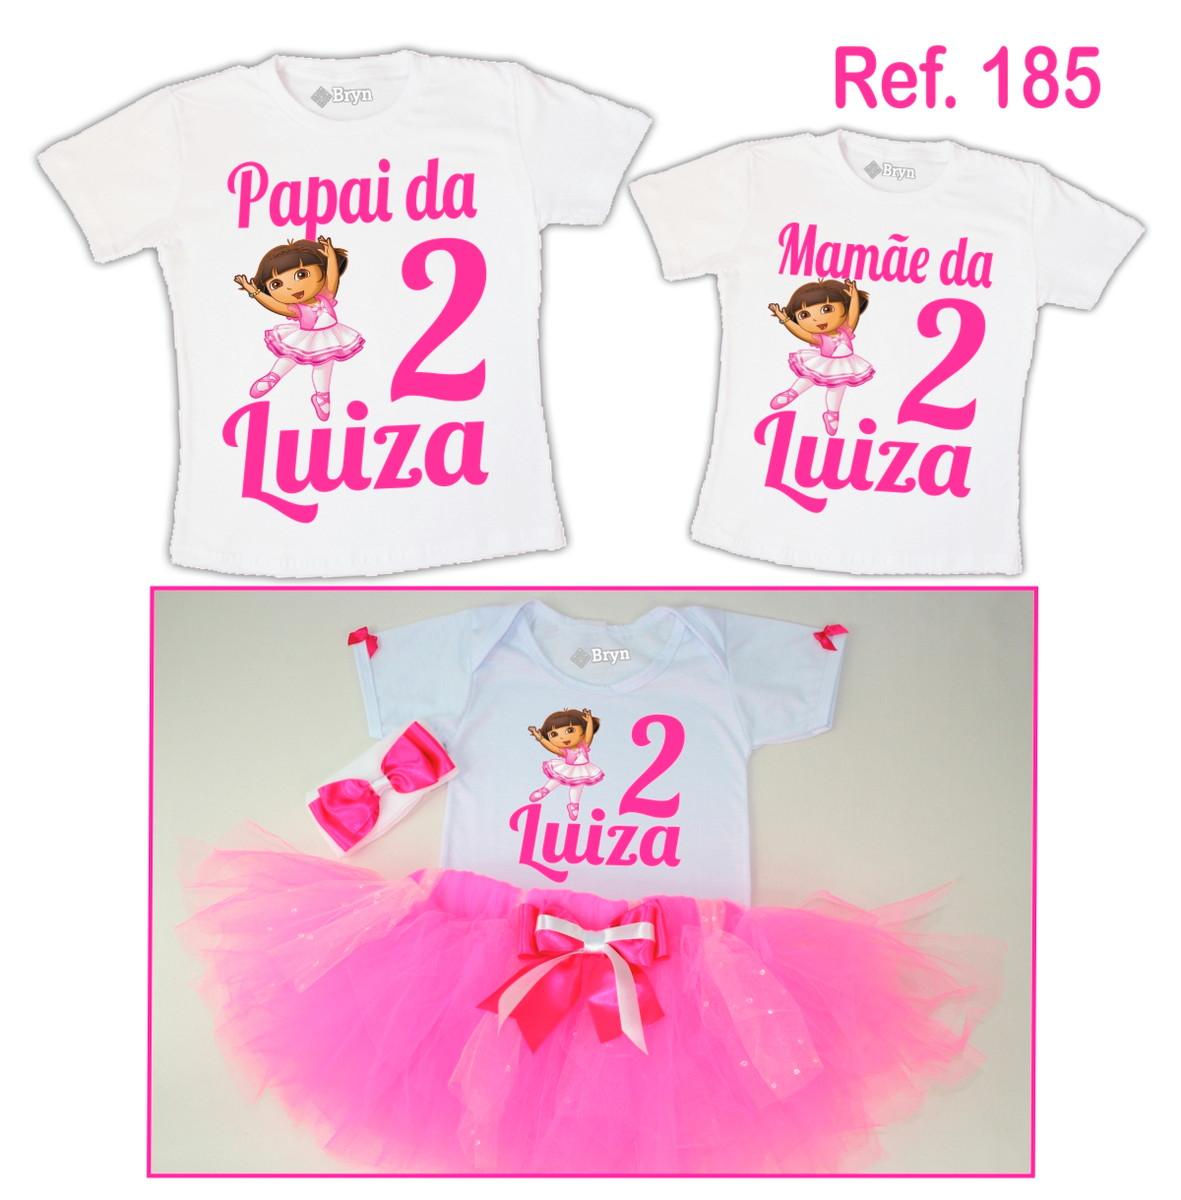 396d210e92 Kit Fantasia Tutu Dora Bailarina Rosa Pink + 2 Camisetas no Elo7 ...